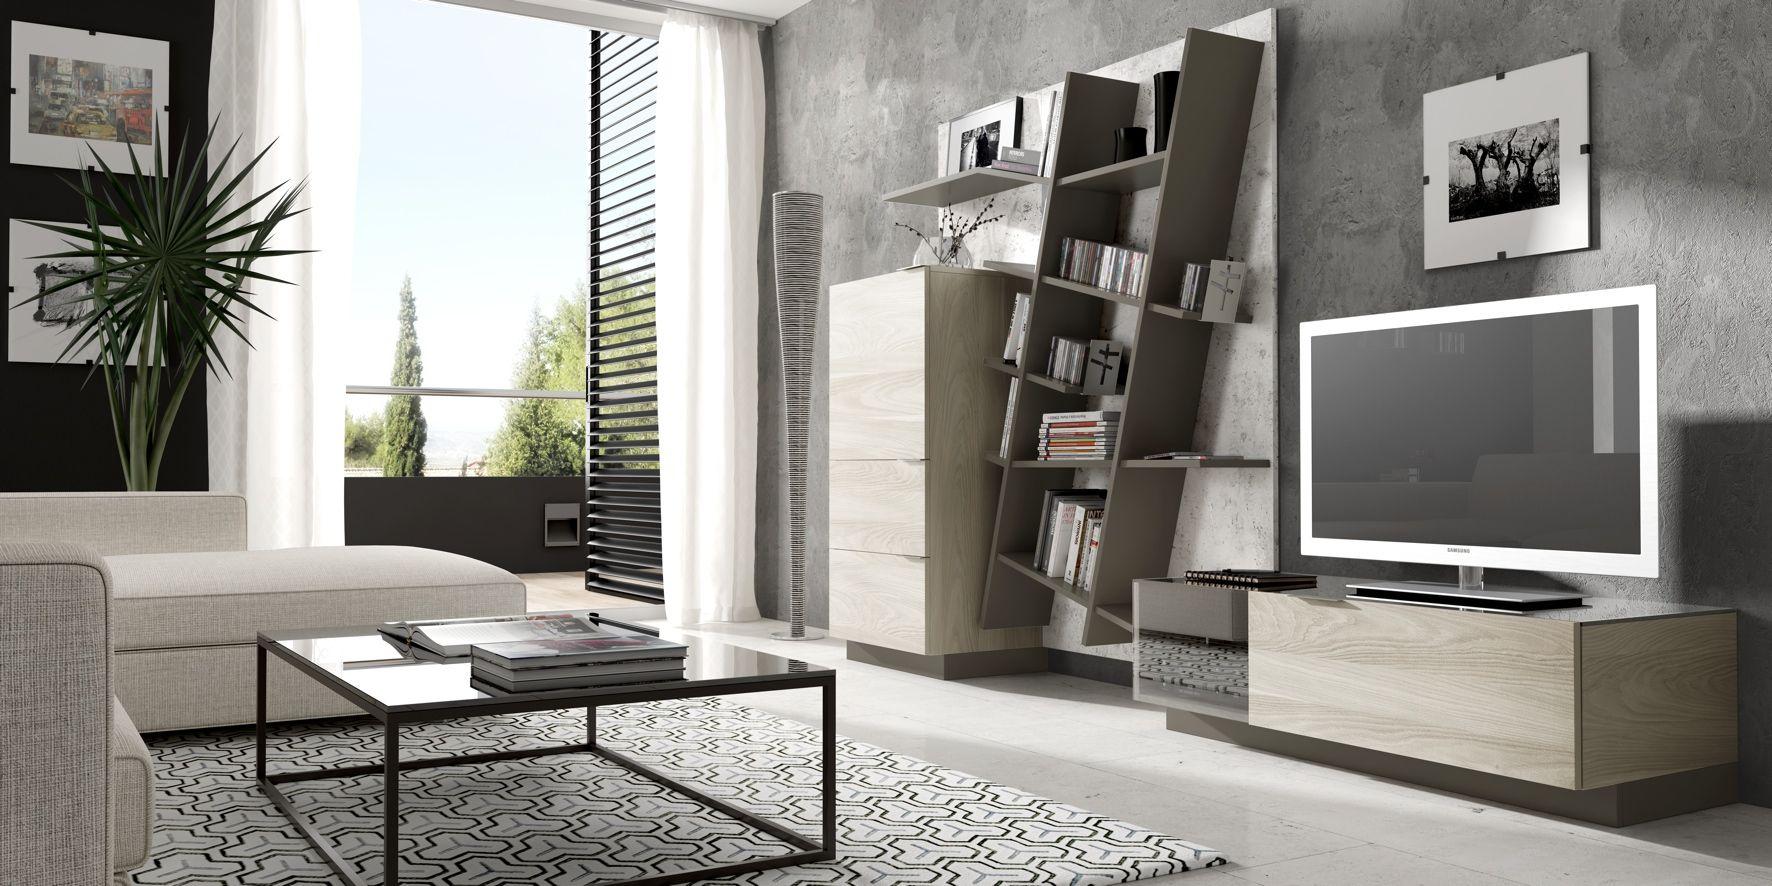 Composici n mueble sal n de muebles piferrer a la venta en for Piferrer muebles catalogo